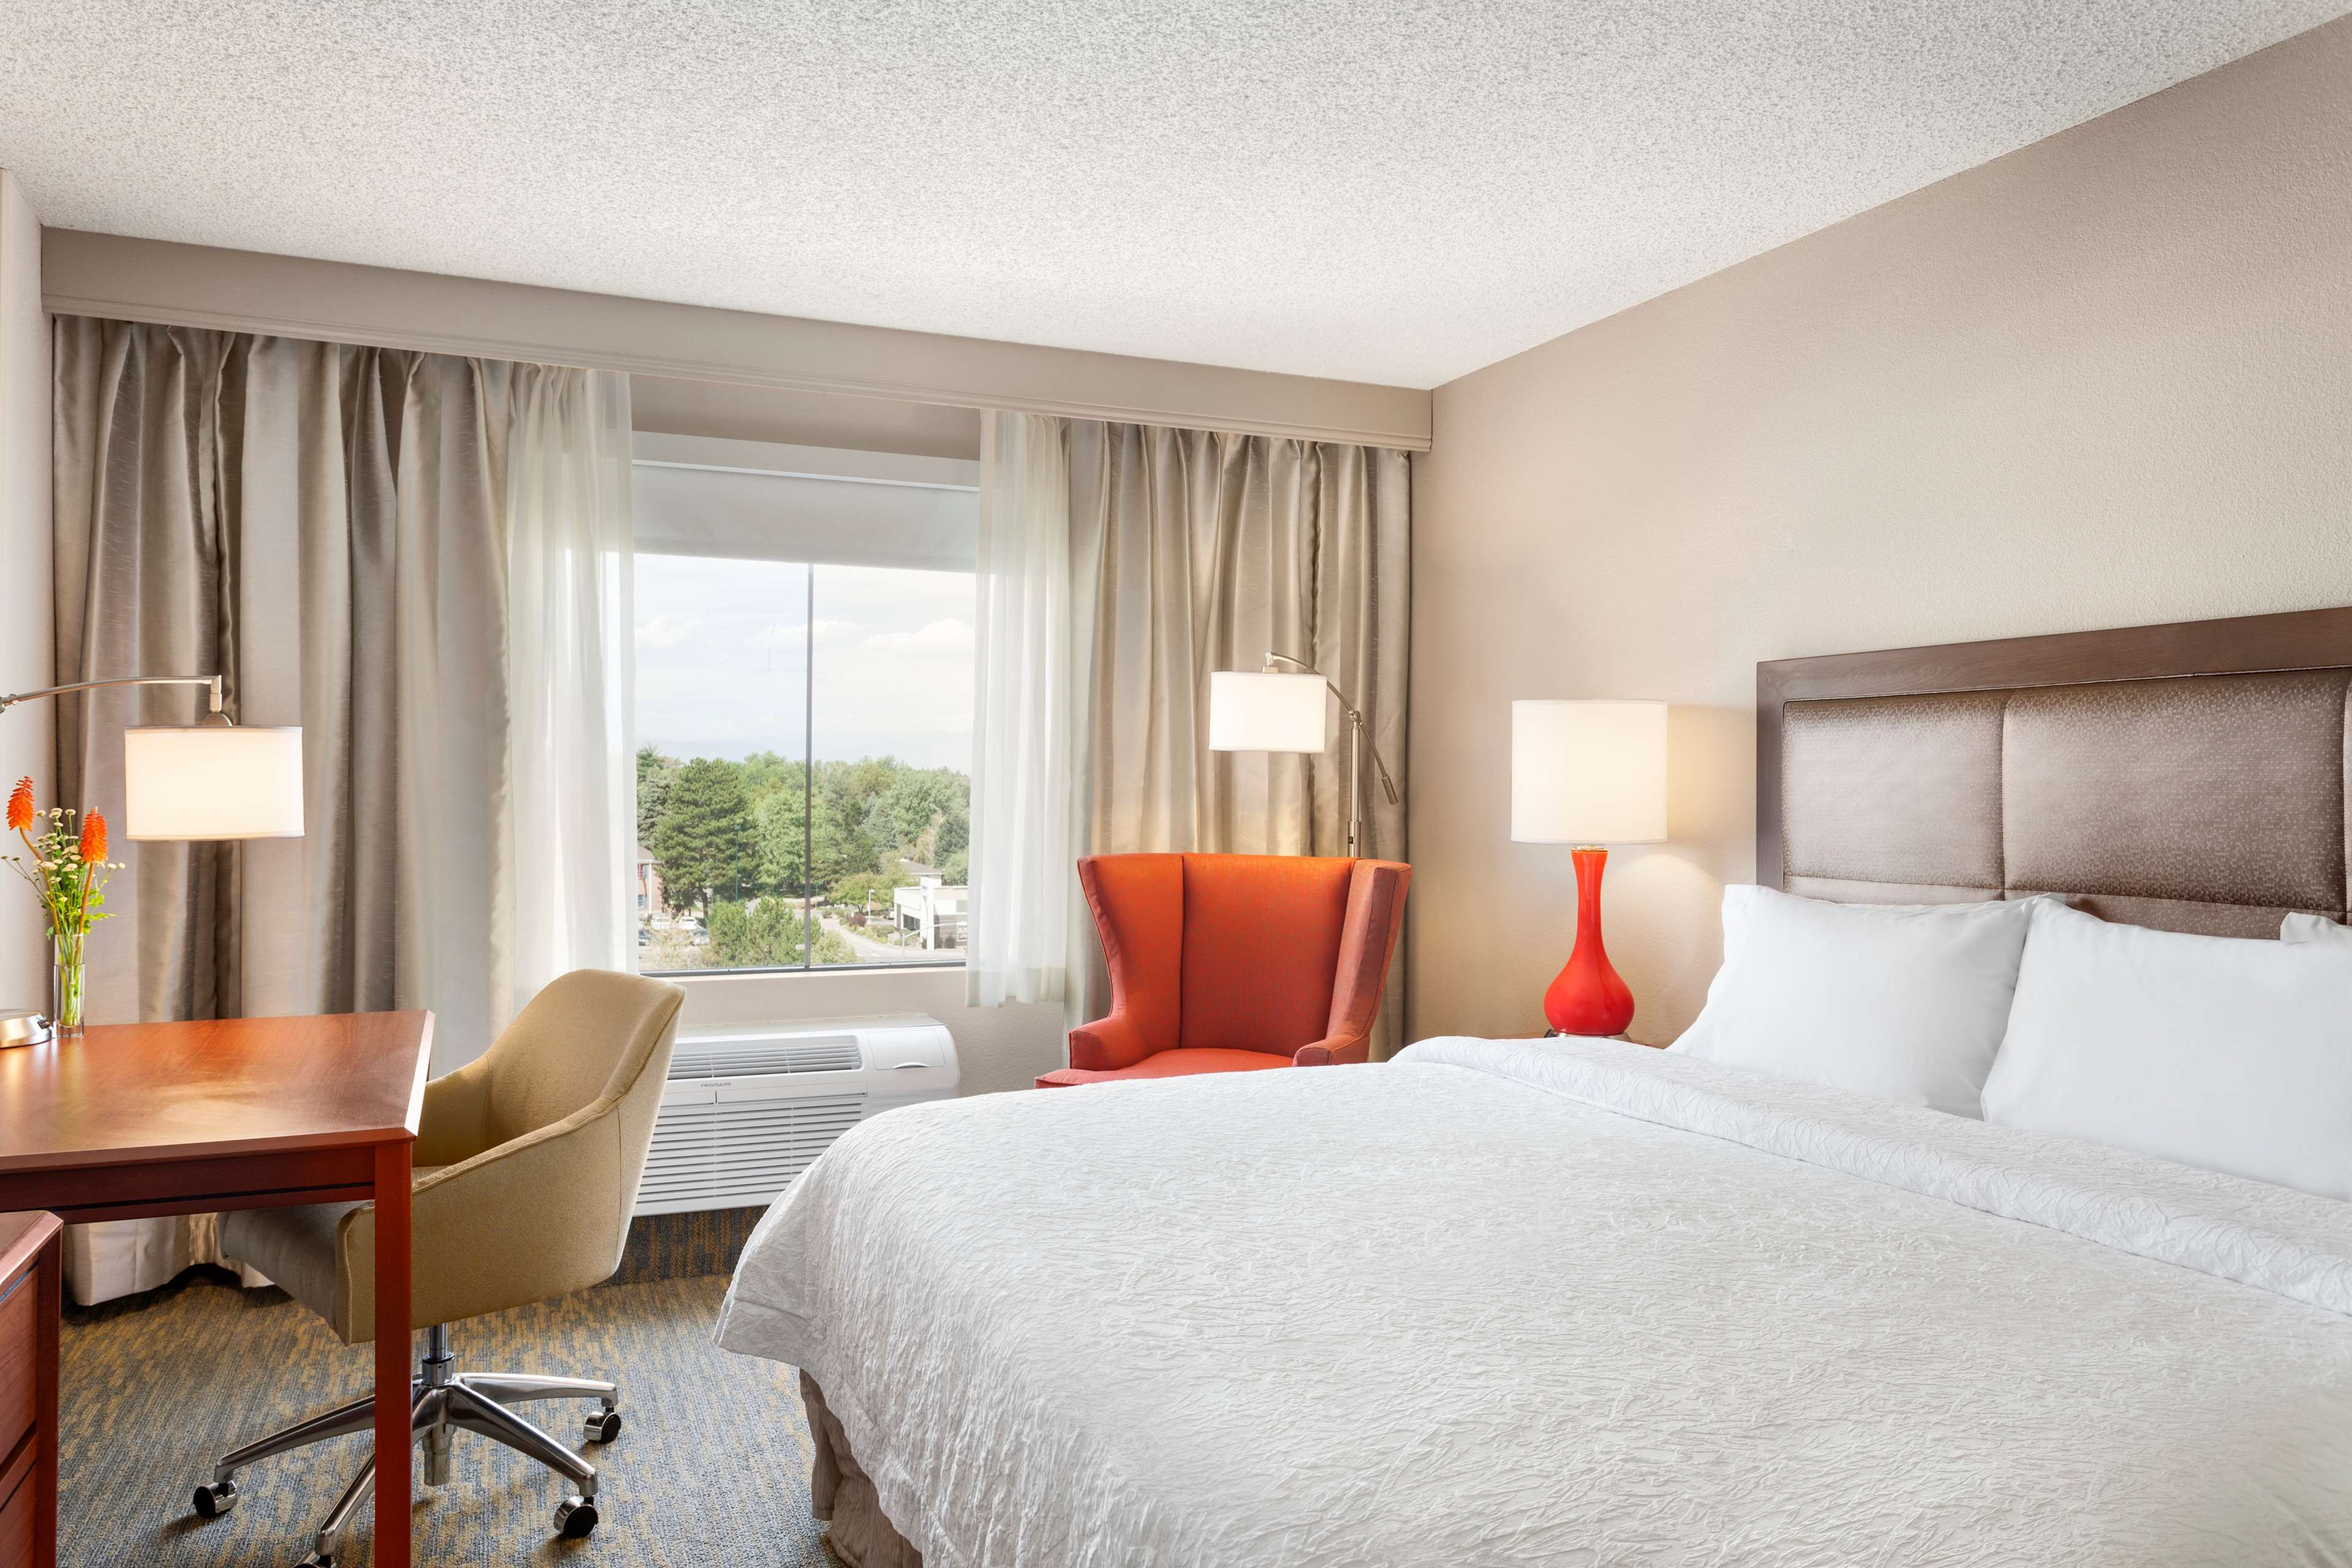 Hampton Inn & Suites Denver-Cherry Creek image 10